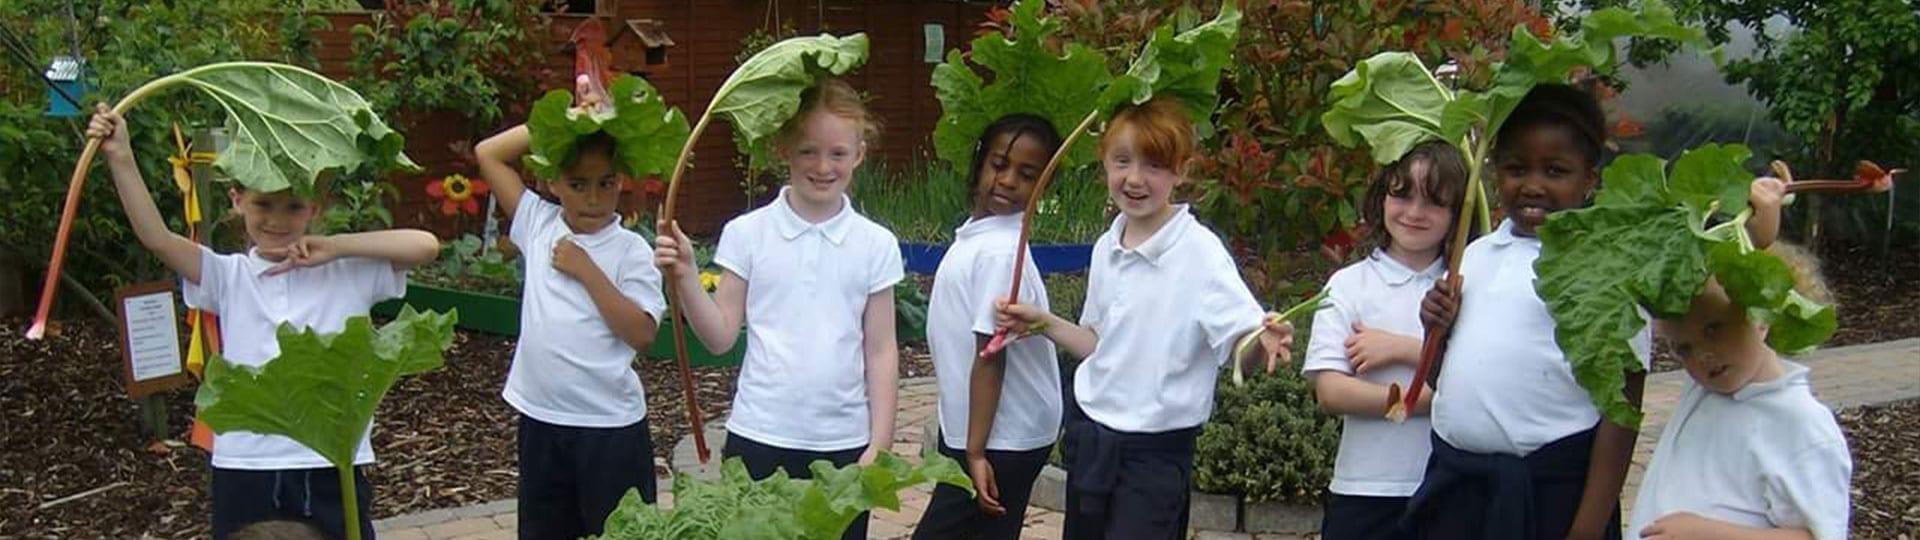 School Tours Children Vegetables Mellowes Banner 1920x540